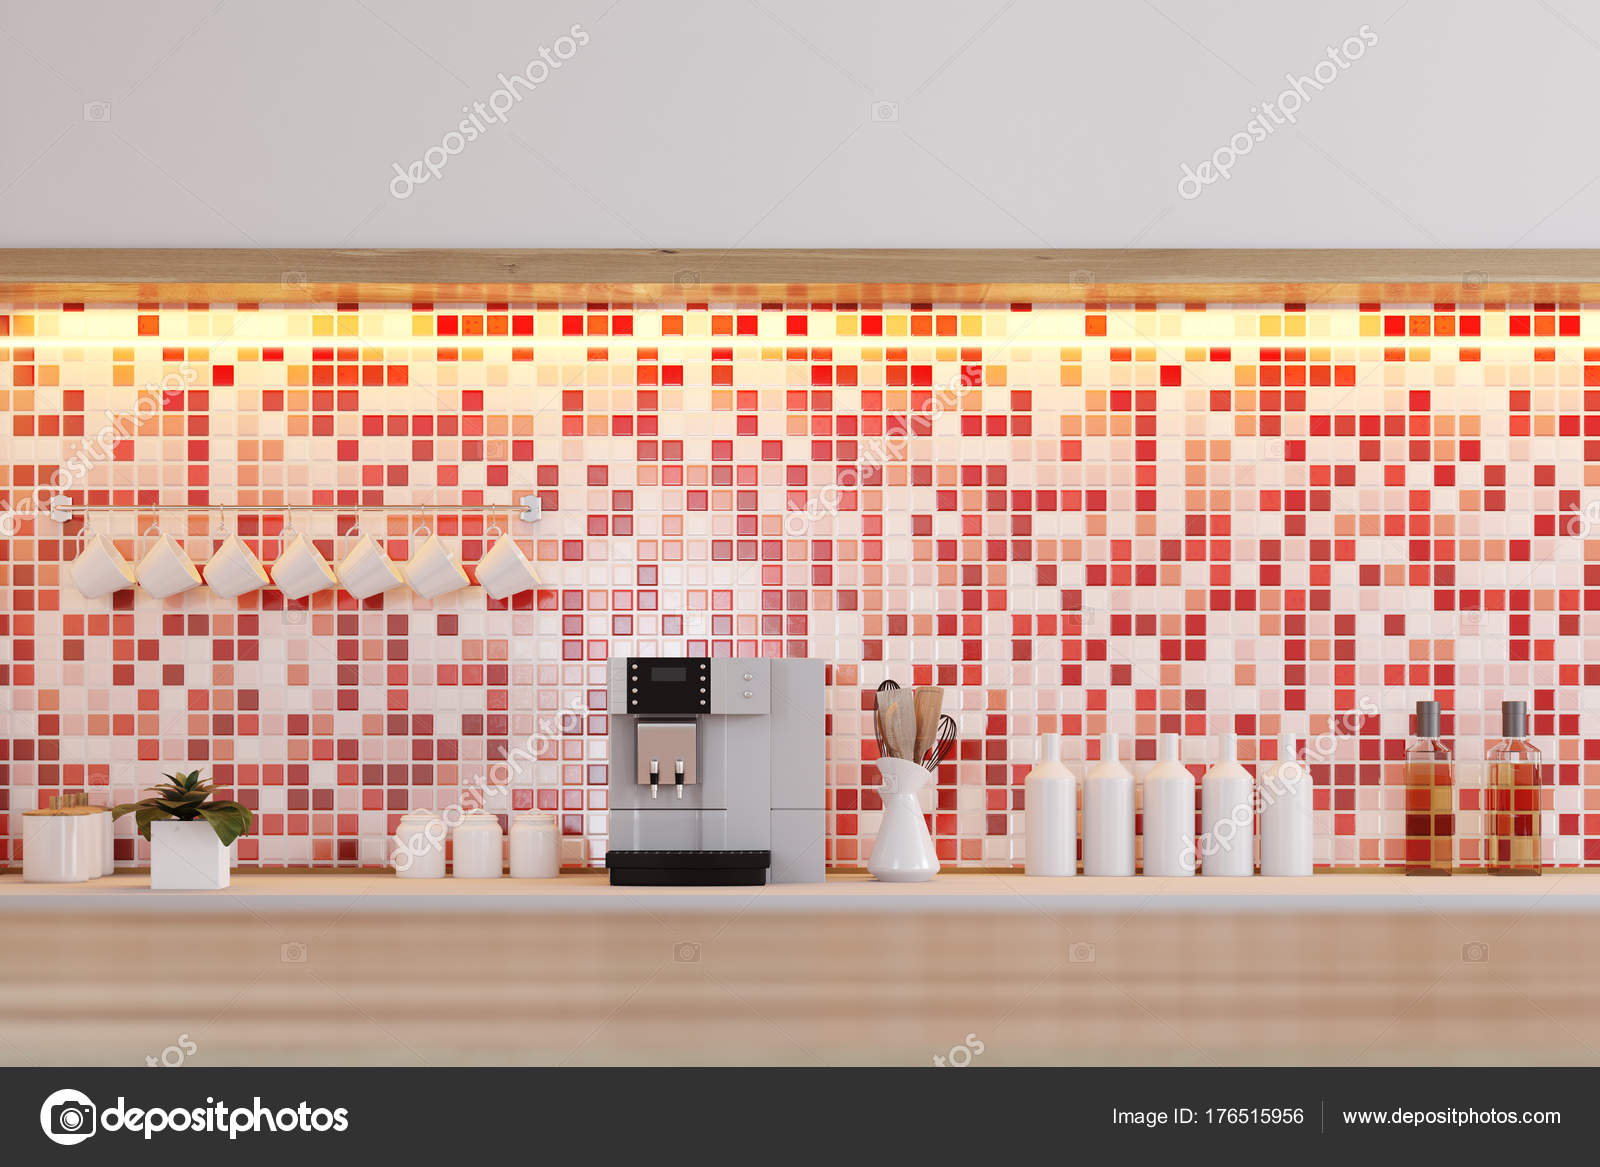 Rote Dachziegel Kuchenarbeitsplatte Stockfoto C Denisismagilov